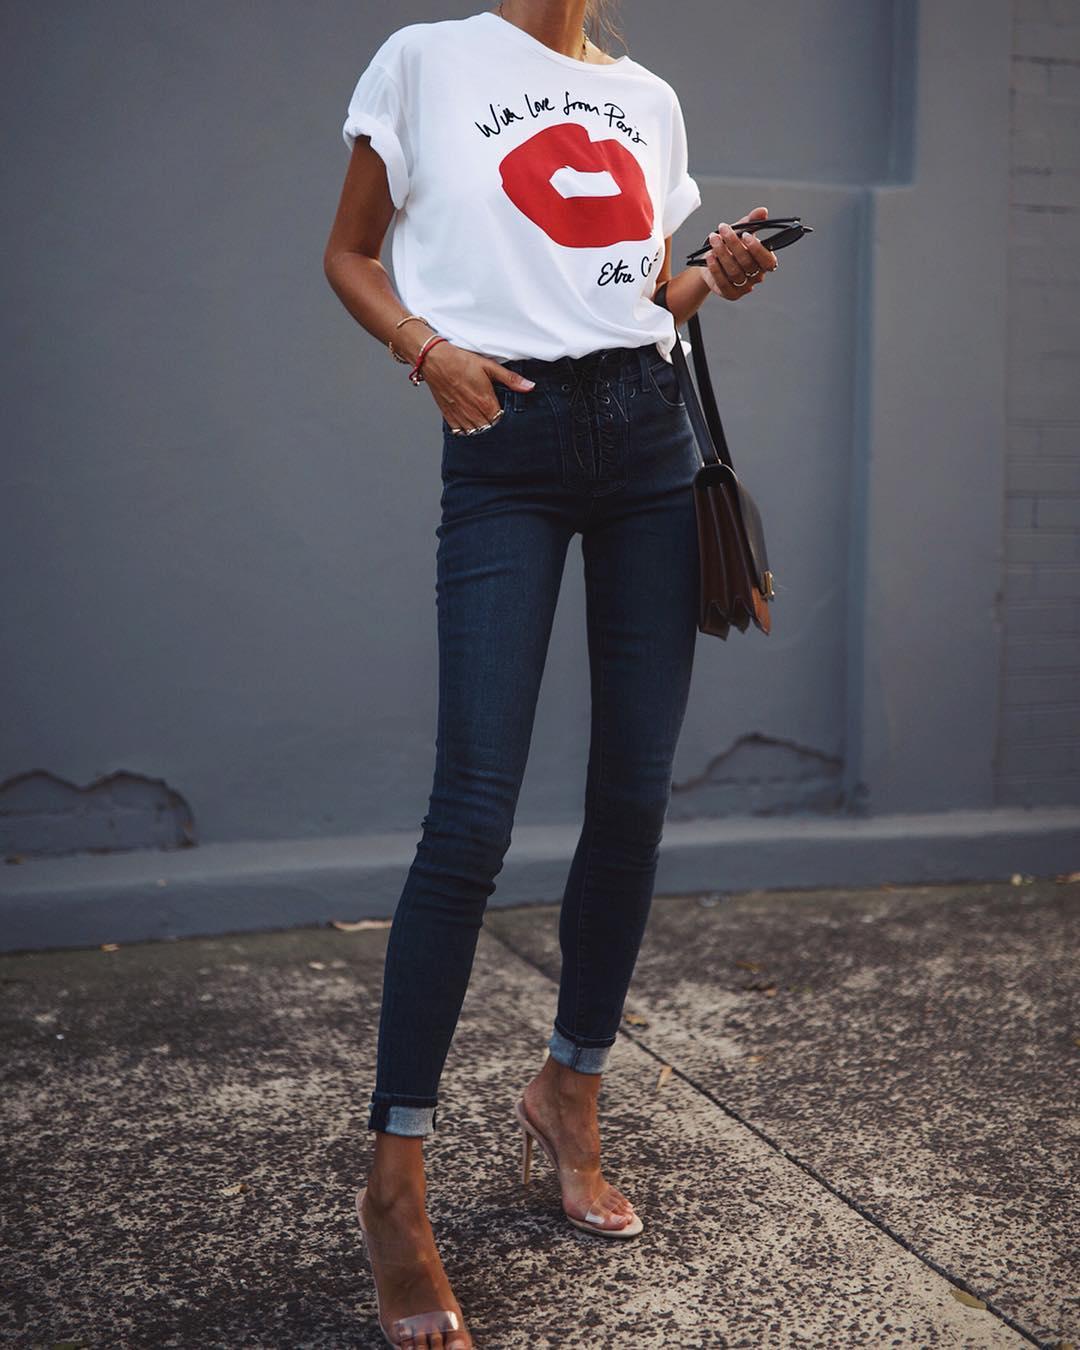 джинсы и футболка фото 8